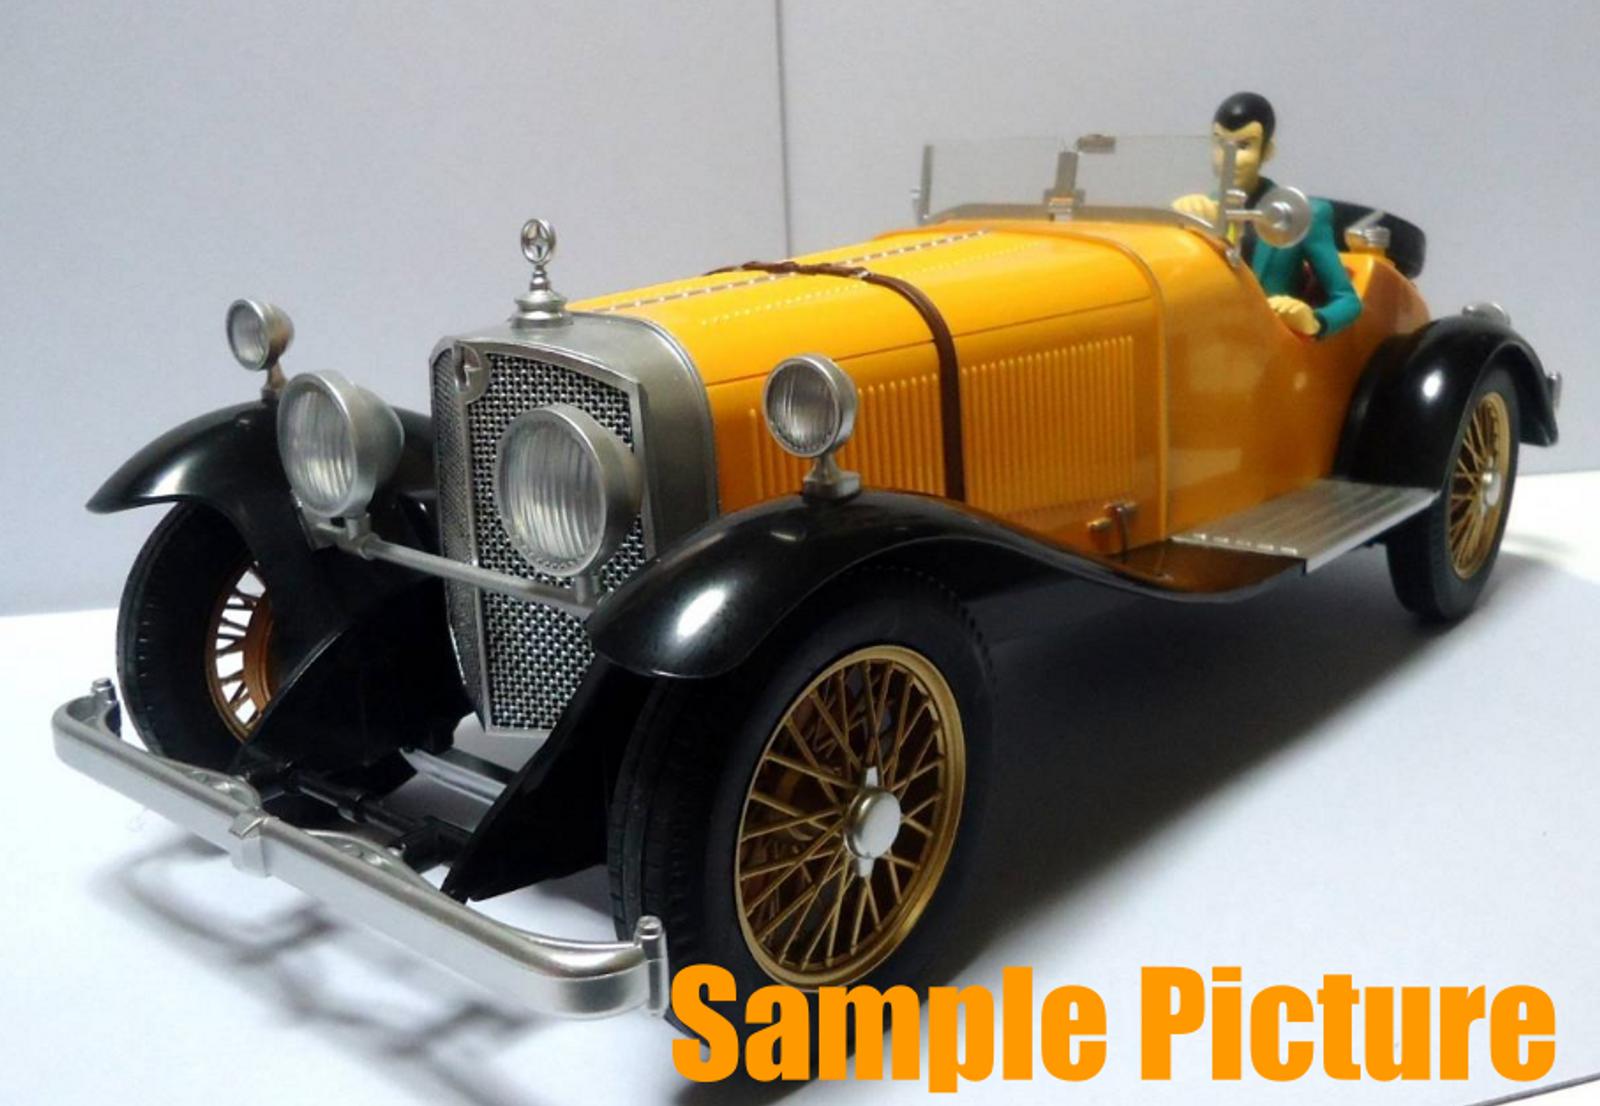 Lupin the Third (3rd) Model Car Mercedes Benz SSK Figure Banpresto JAPAN